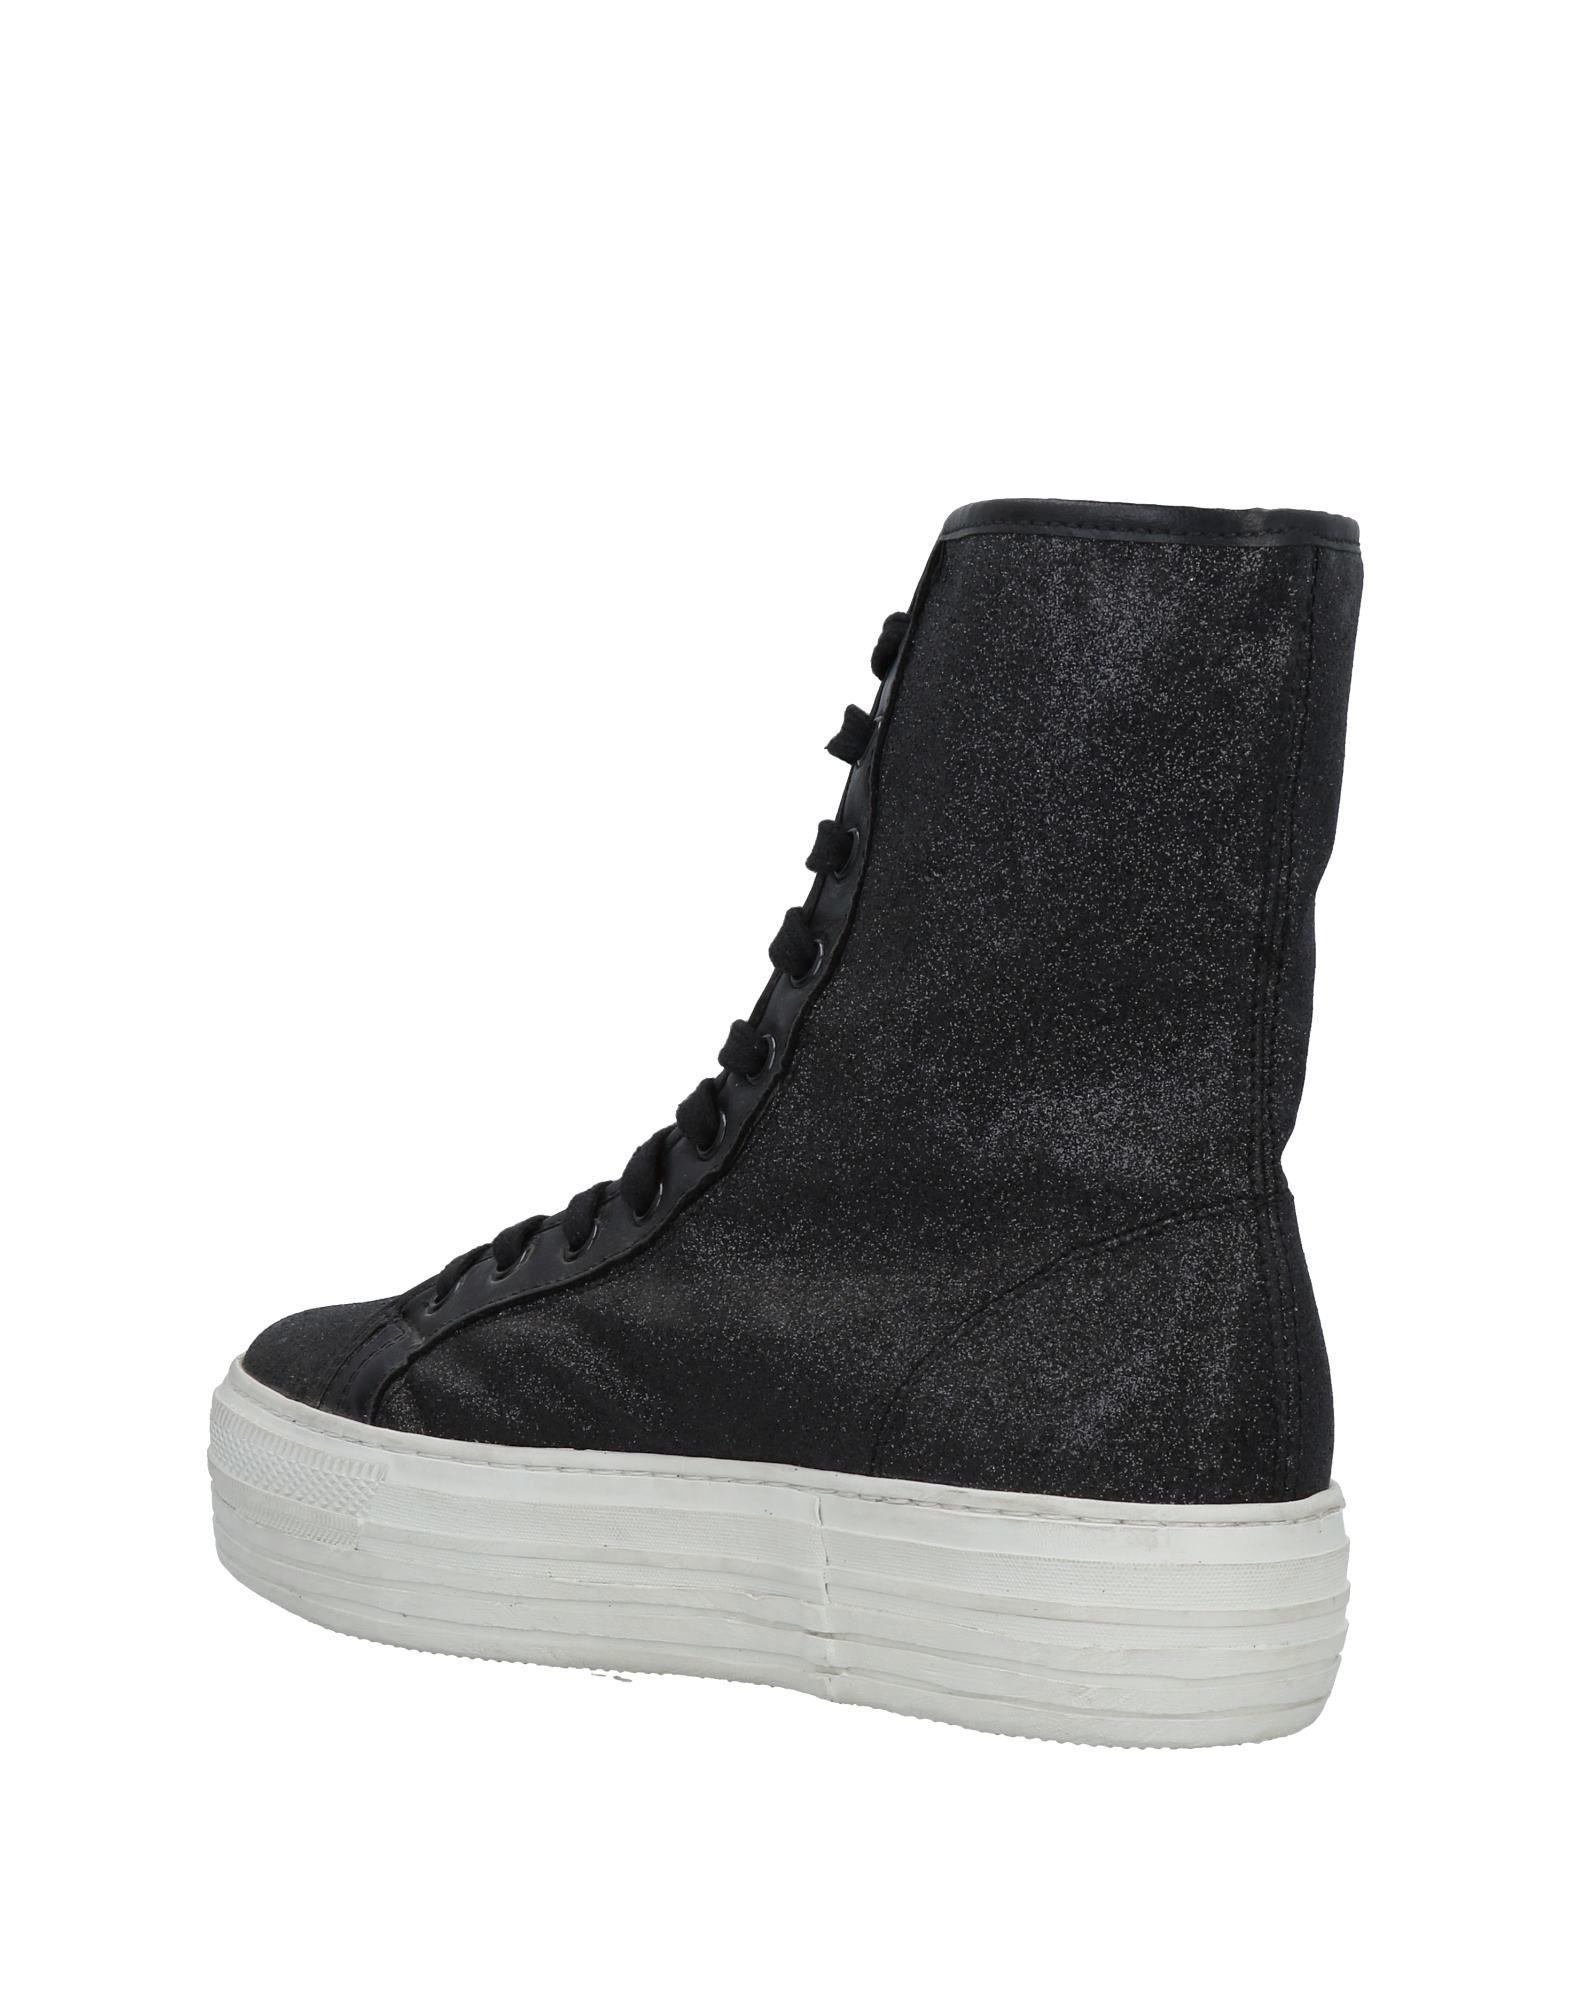 Stilvolle billige  Schuhe Cult Sneakers Damen  billige 11487708FW 5c686b